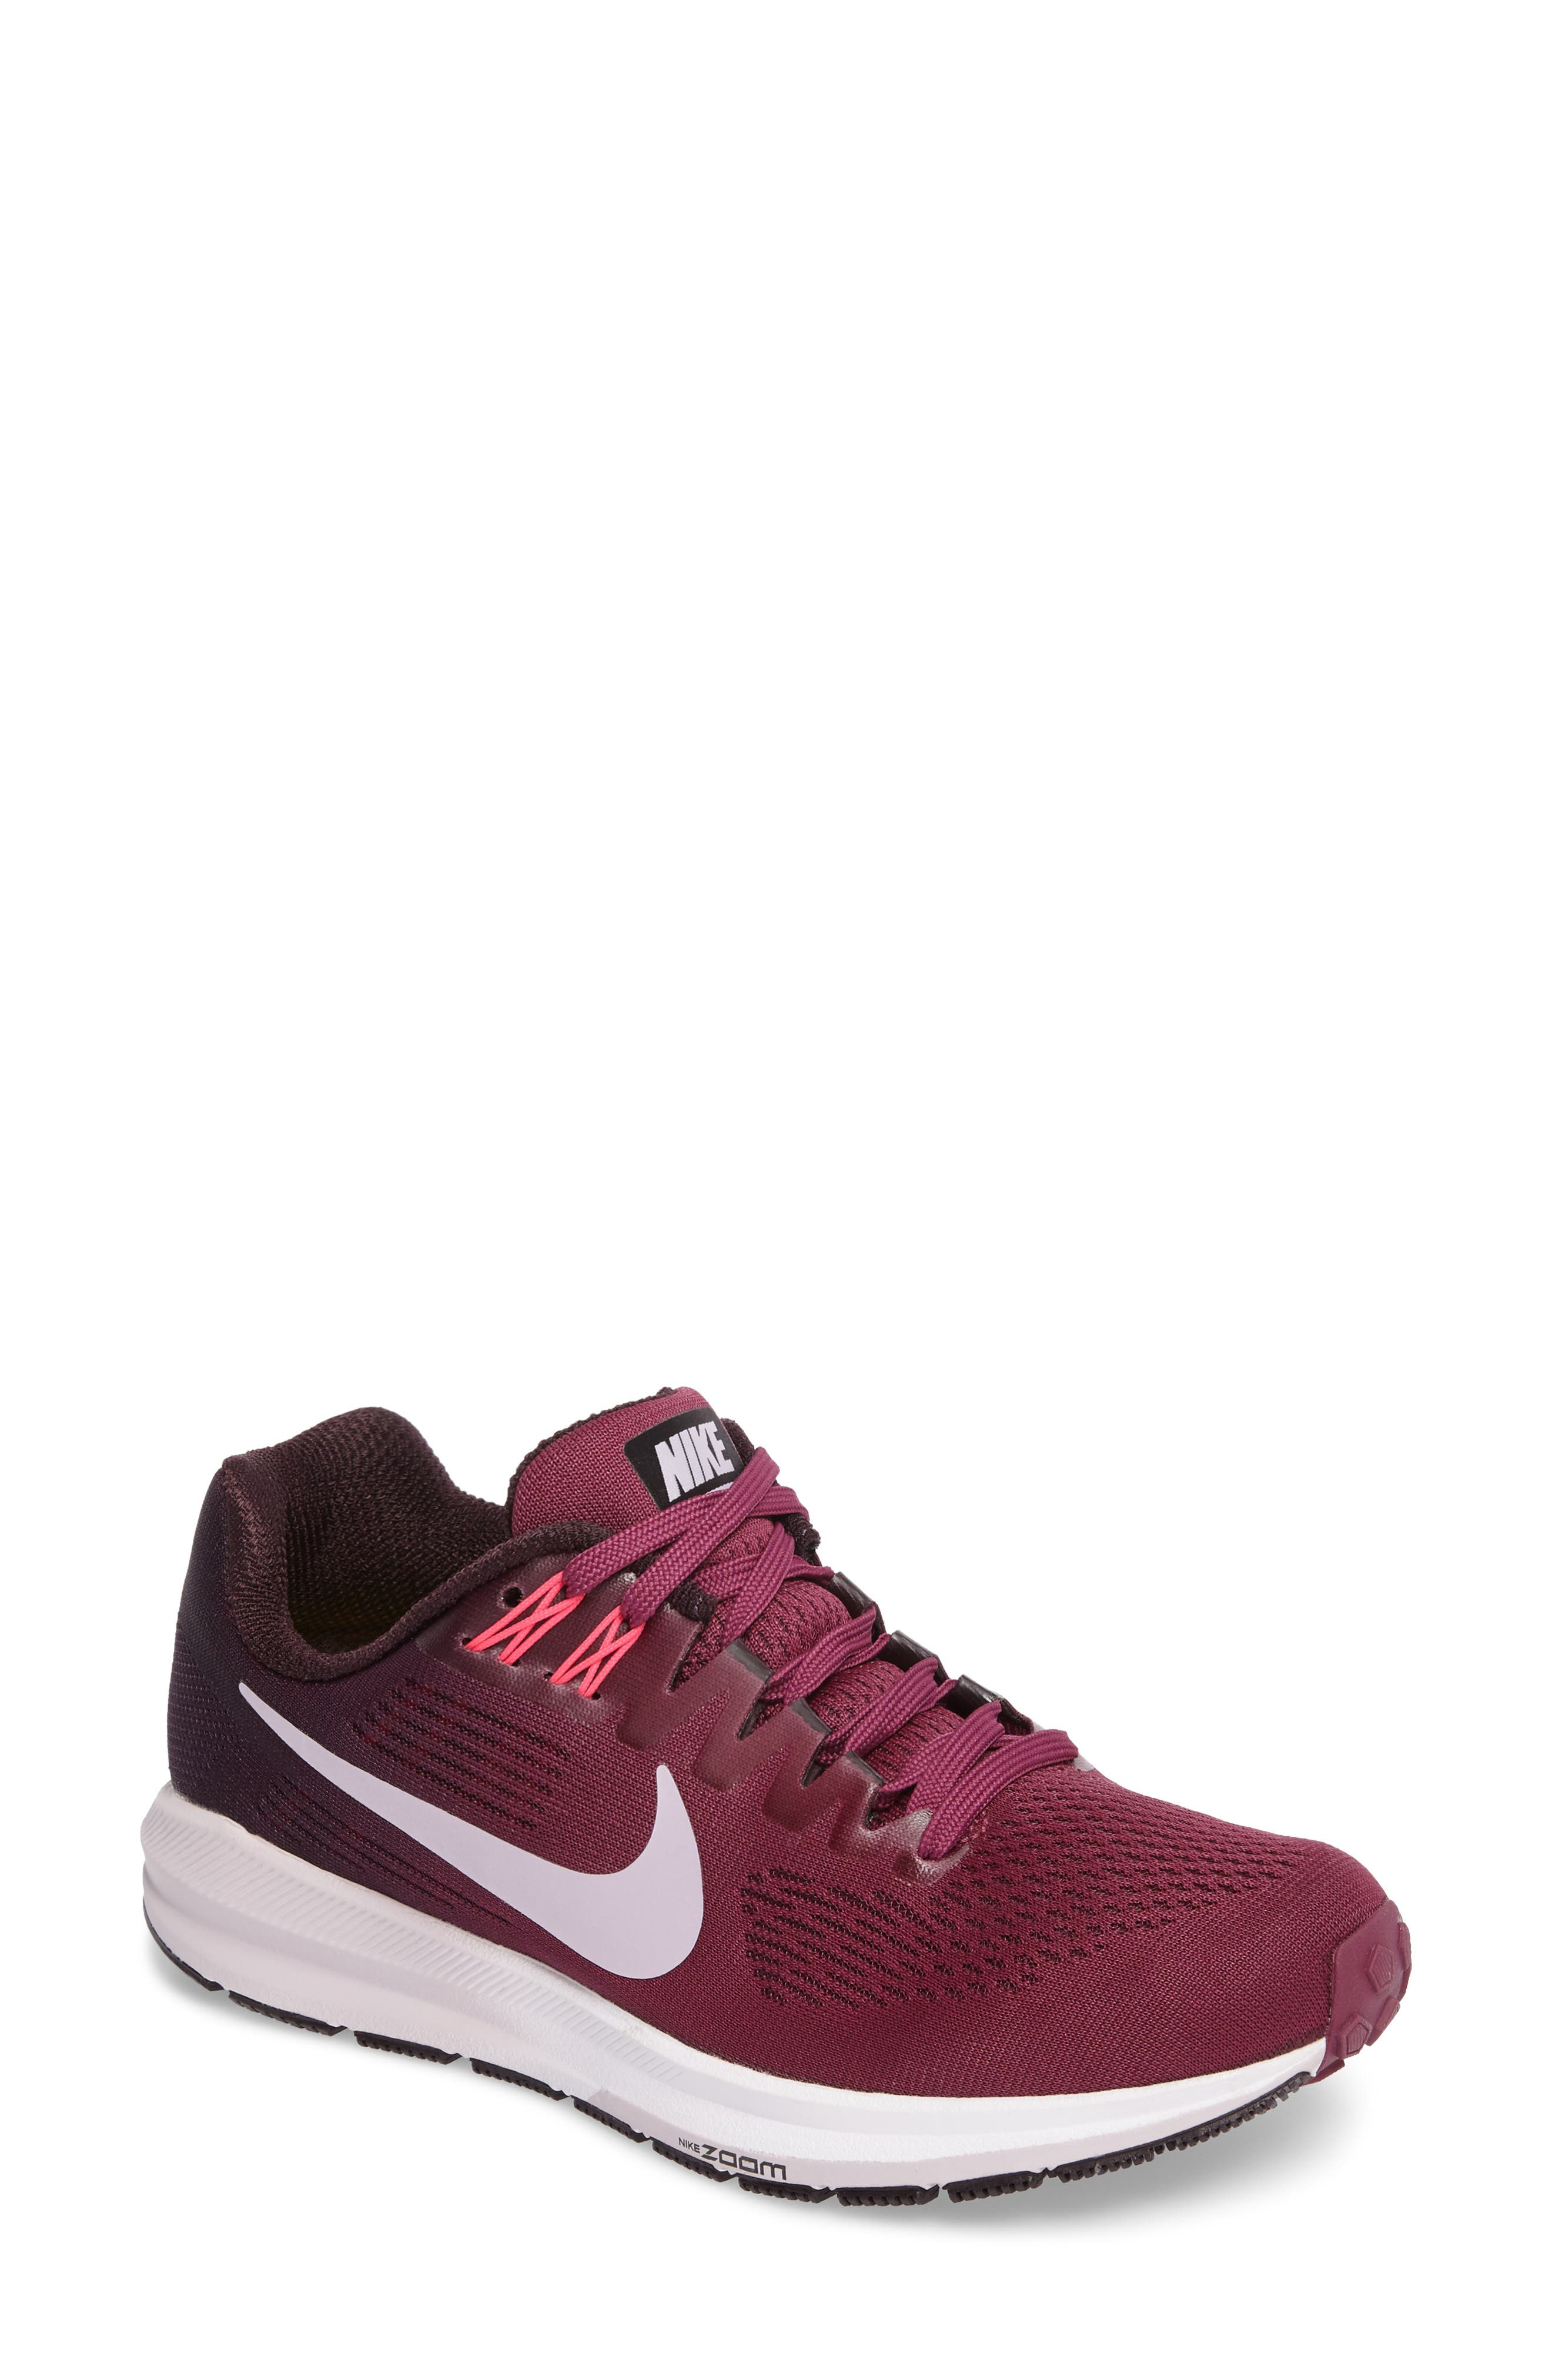 Main Image - Nike Air Zoom Structure 21 Running Shoe (Women)